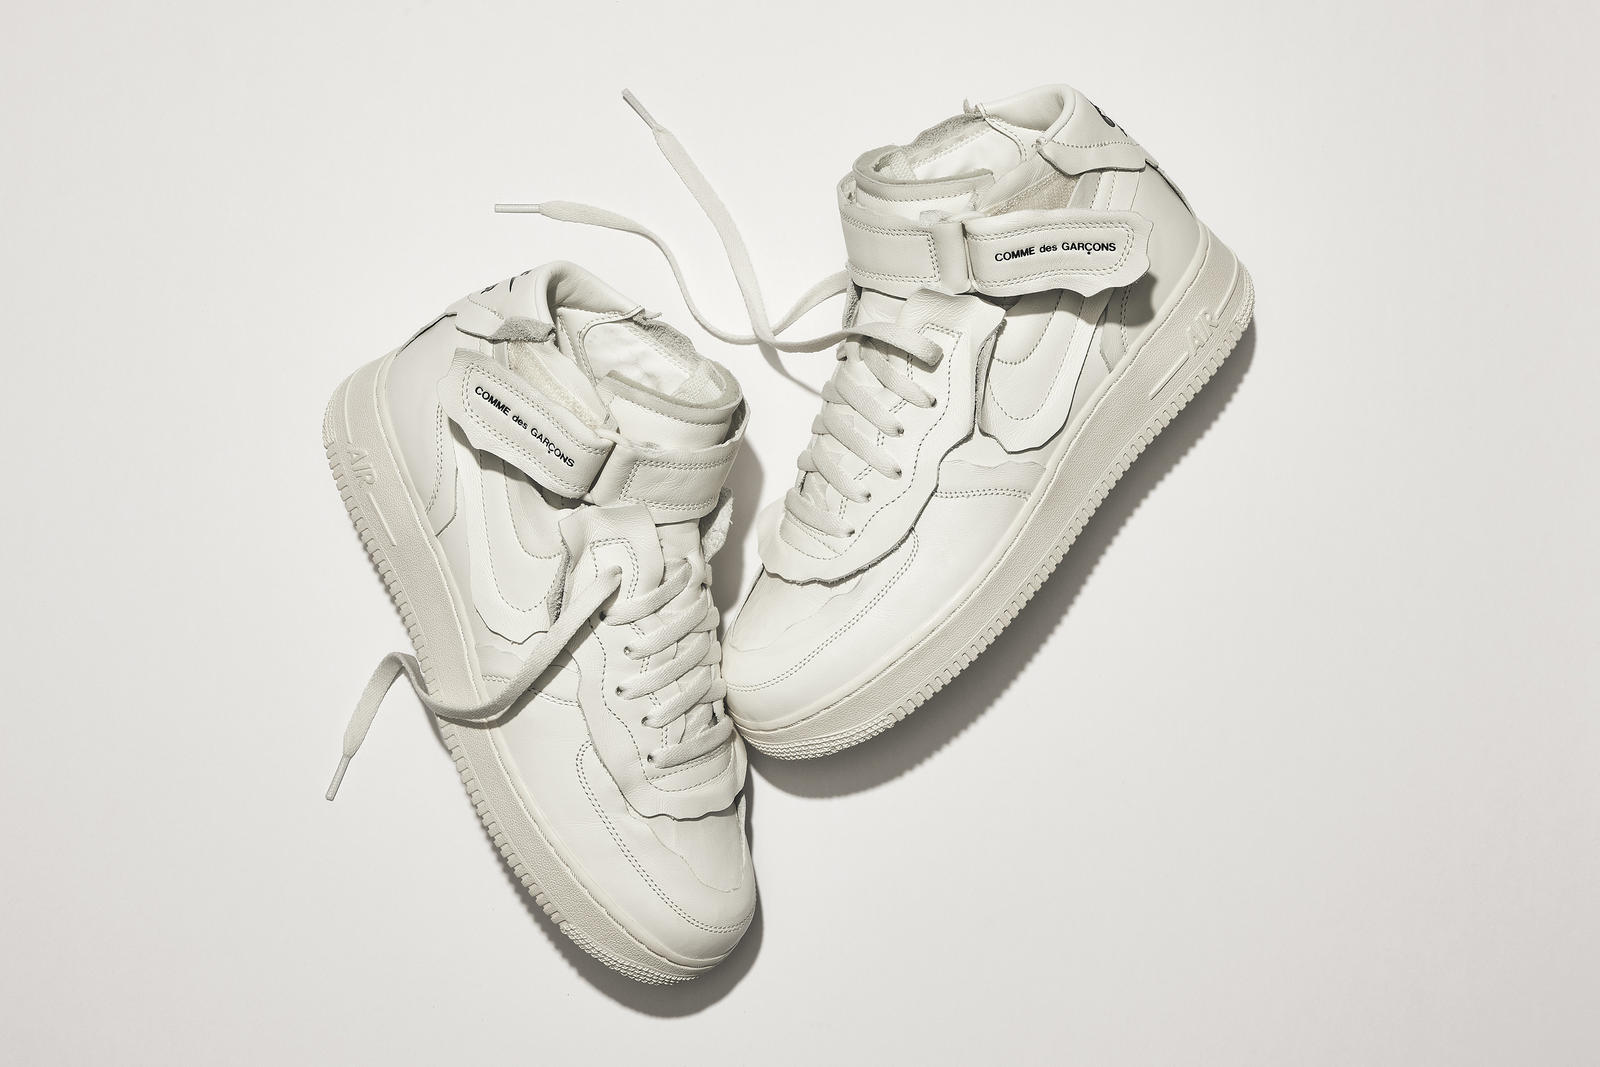 10月23日 発売予定 Nike x COMME des GARÇONS Air Force 1 Mid